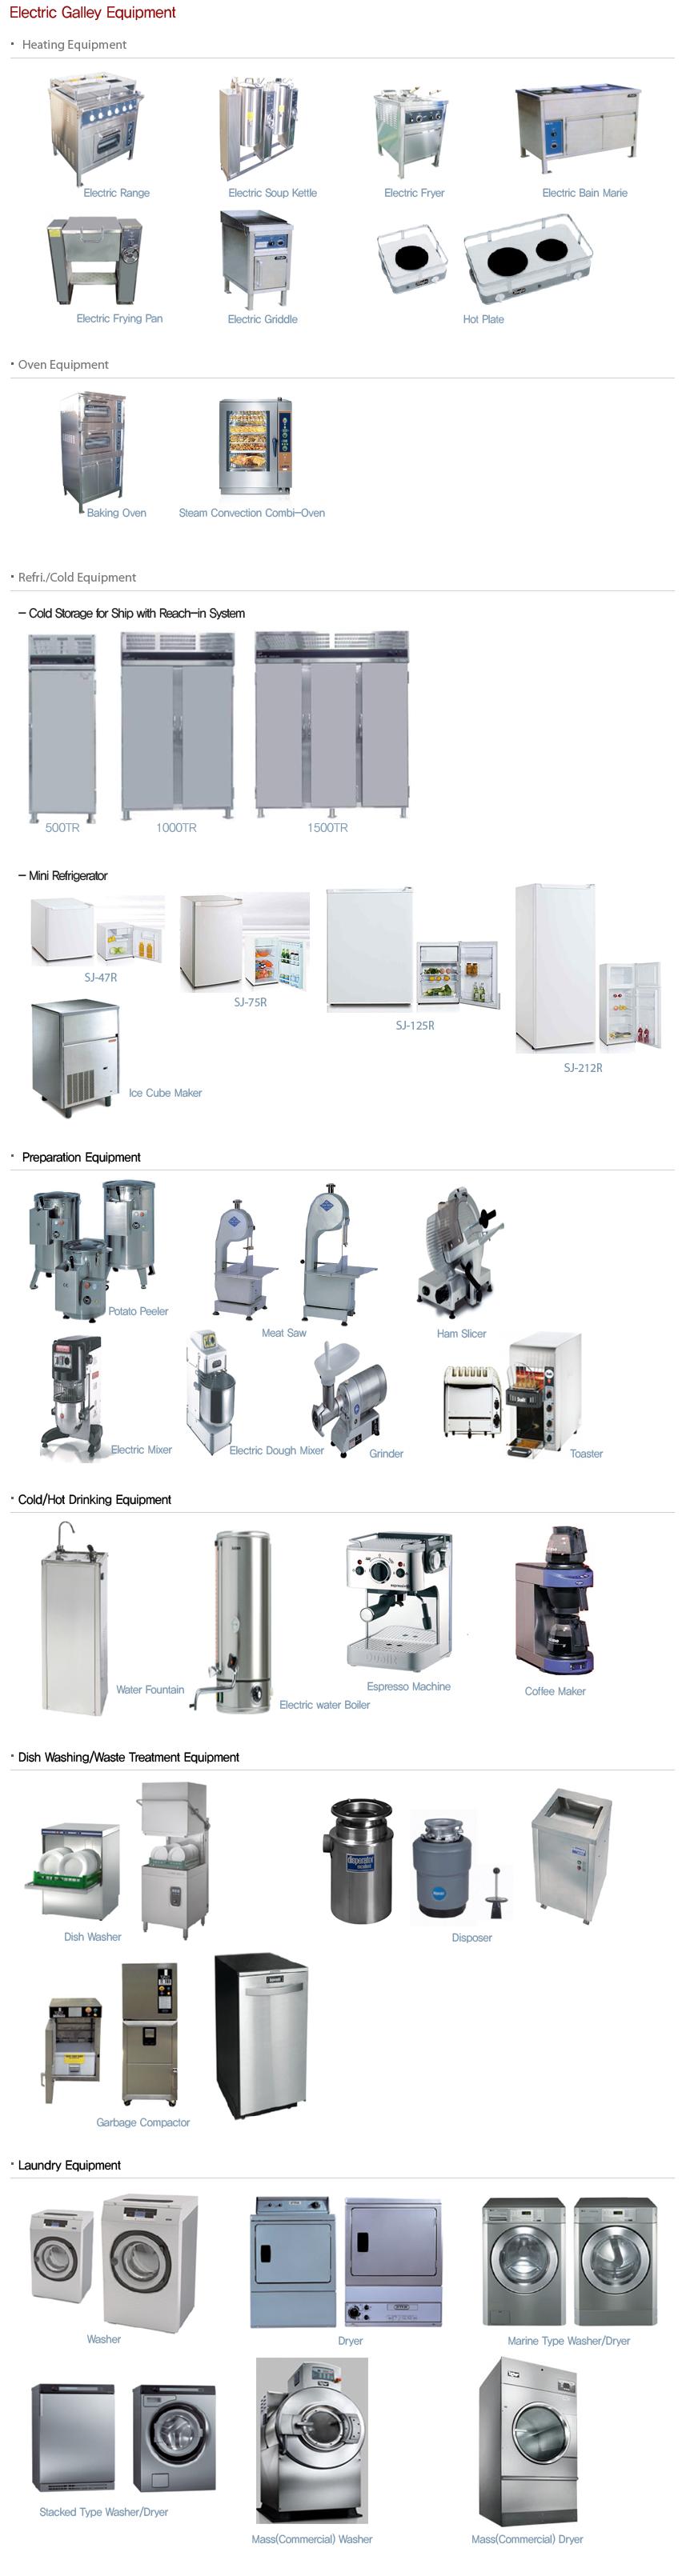 Samjoo ENG Galley Equipment